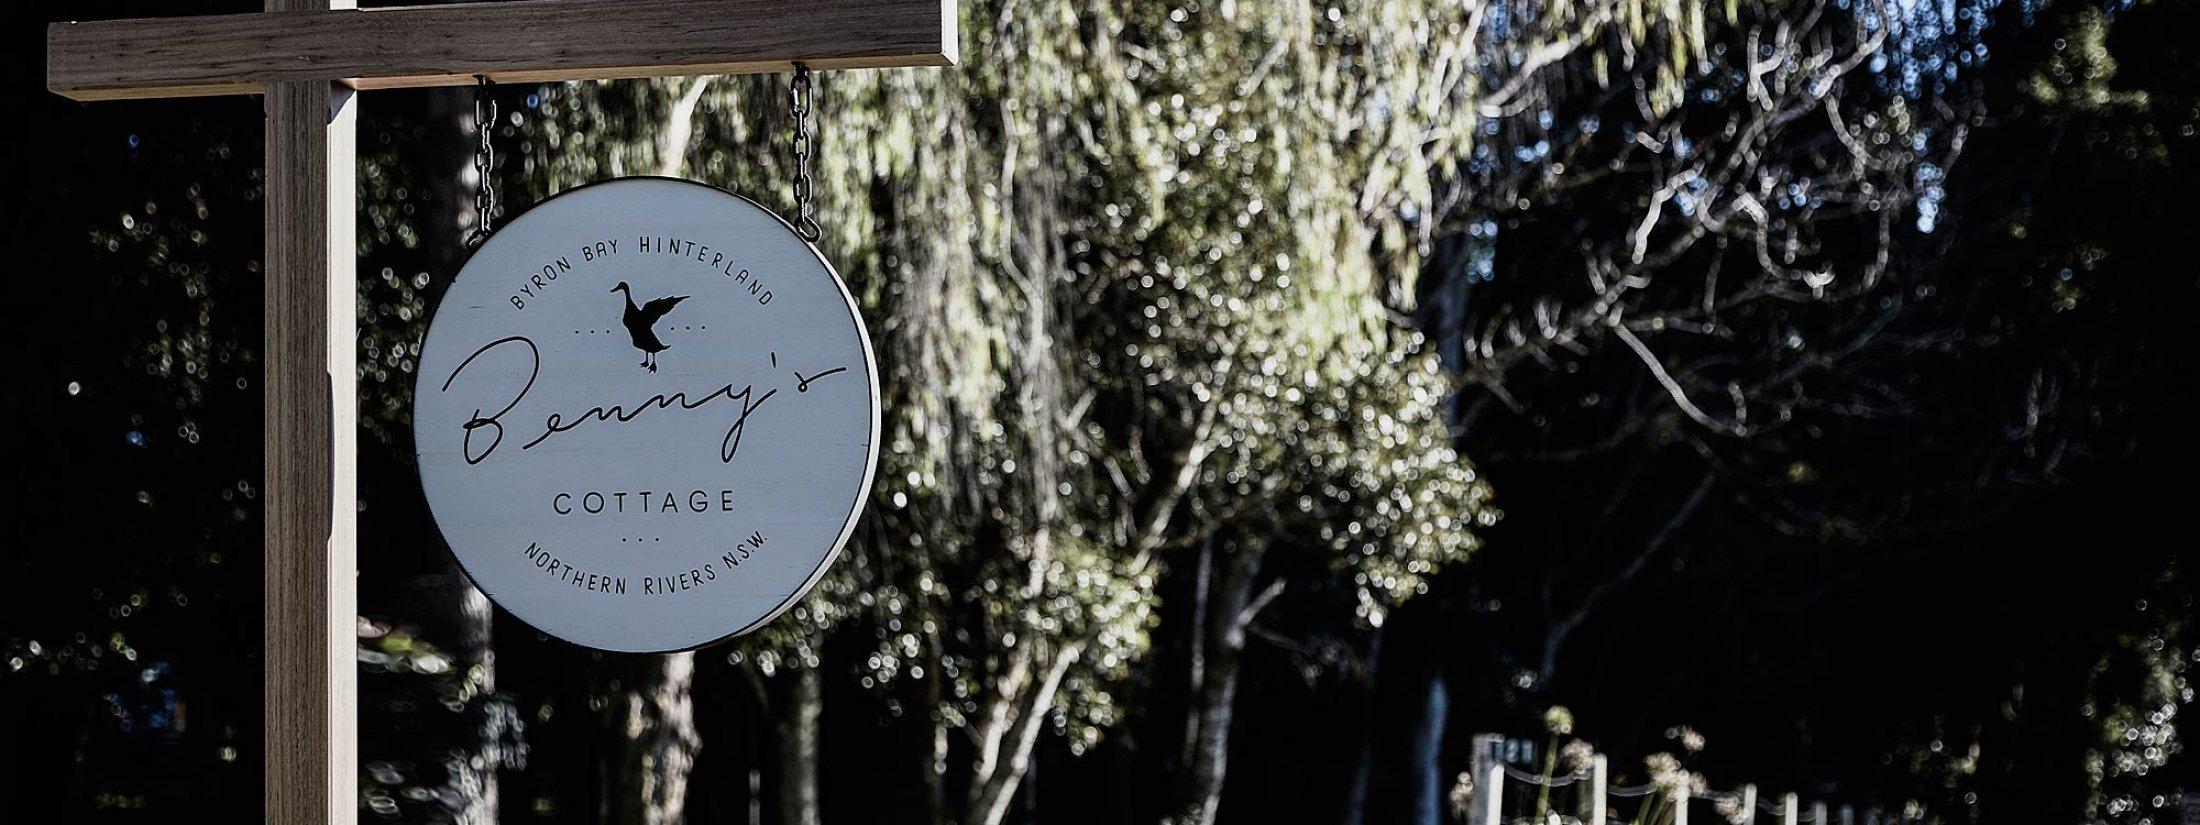 Bennys Cottage - Byron Bay - Real Living Shoot Sign